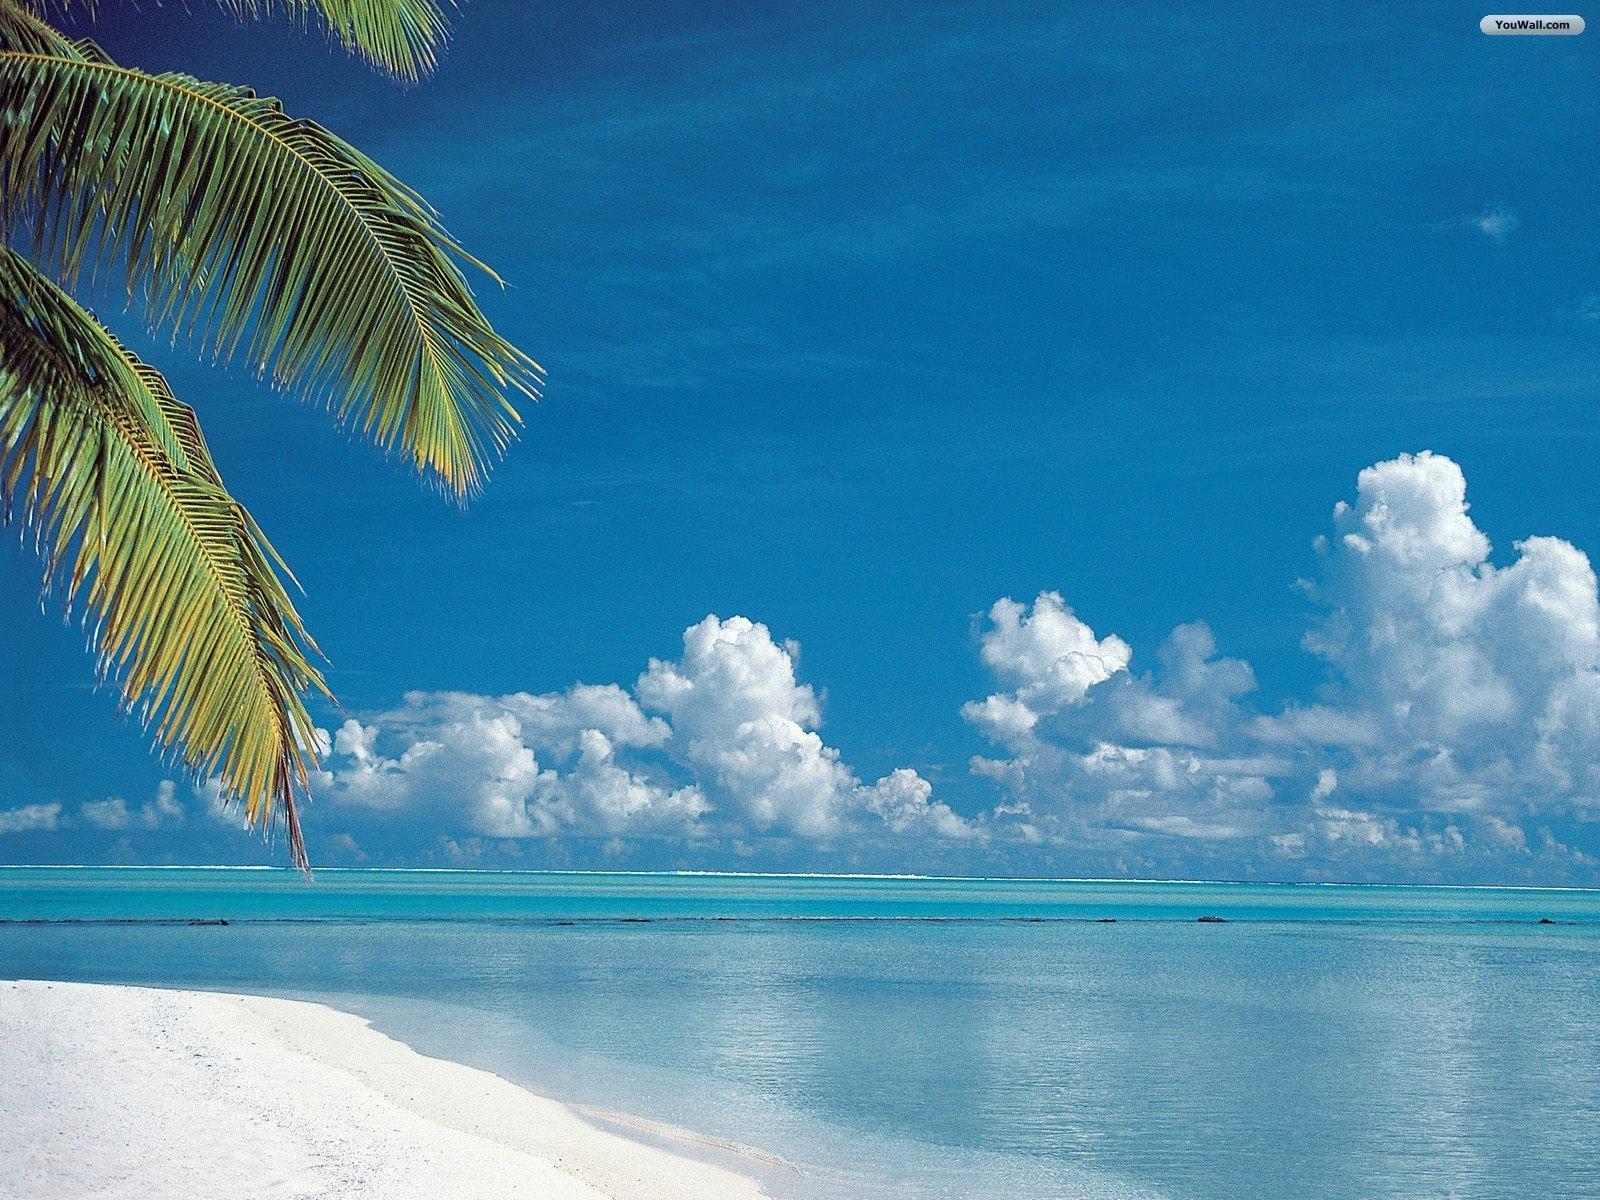 Tropical Beach Screensavers And Wallpaper: Free Tropical Screensavers And Wallpaper